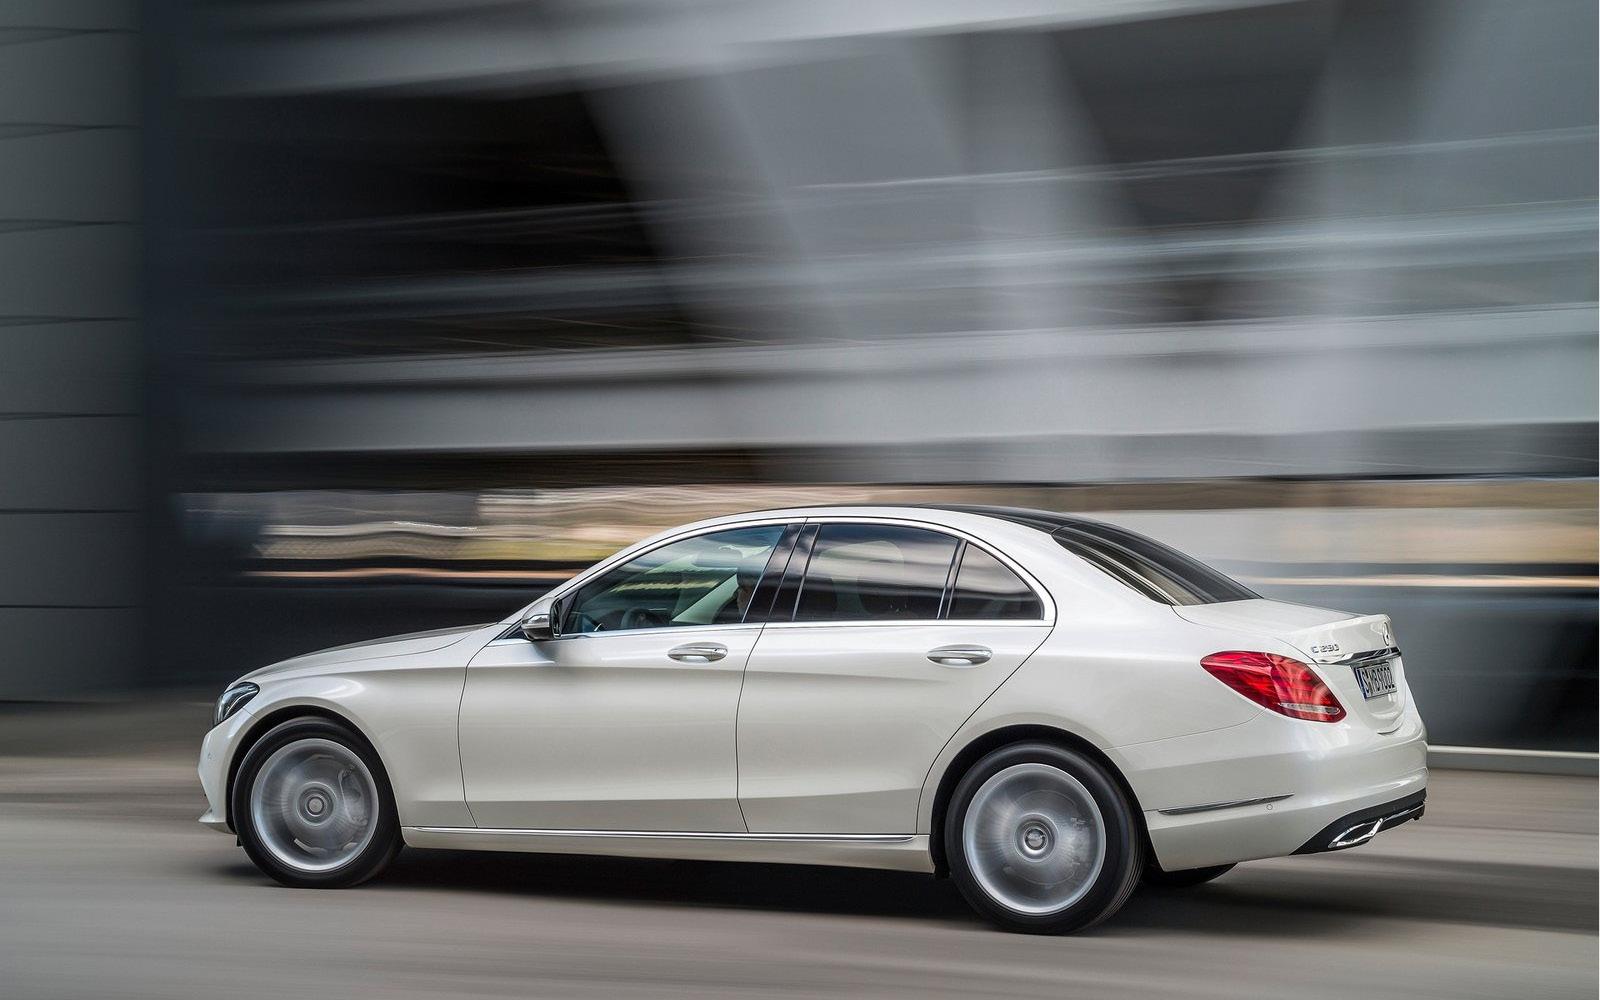 Mercedes benz clase c 2015 7 53 for Mercedes benz clase c